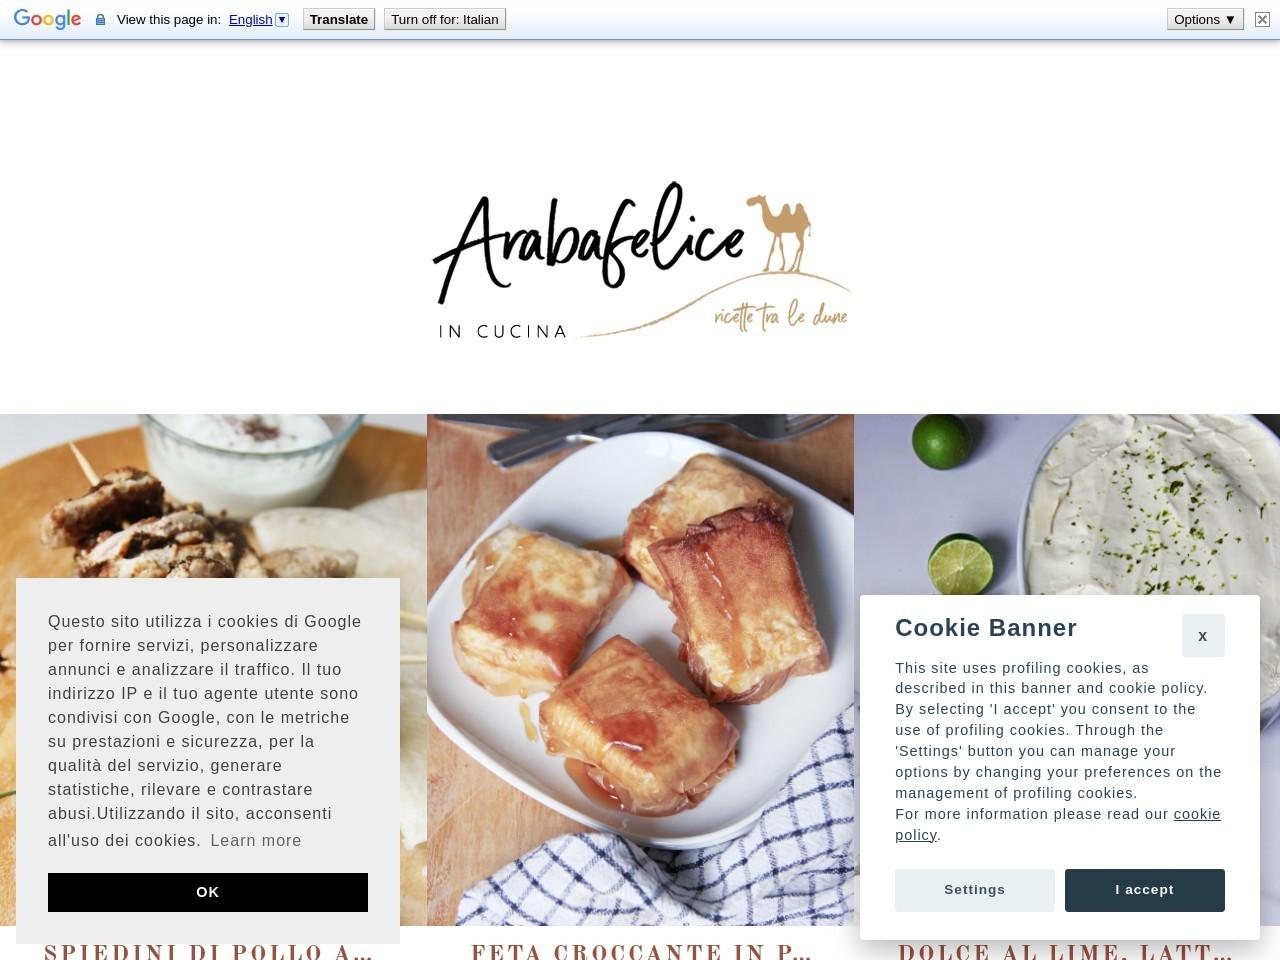 arabafelice-in-cucina